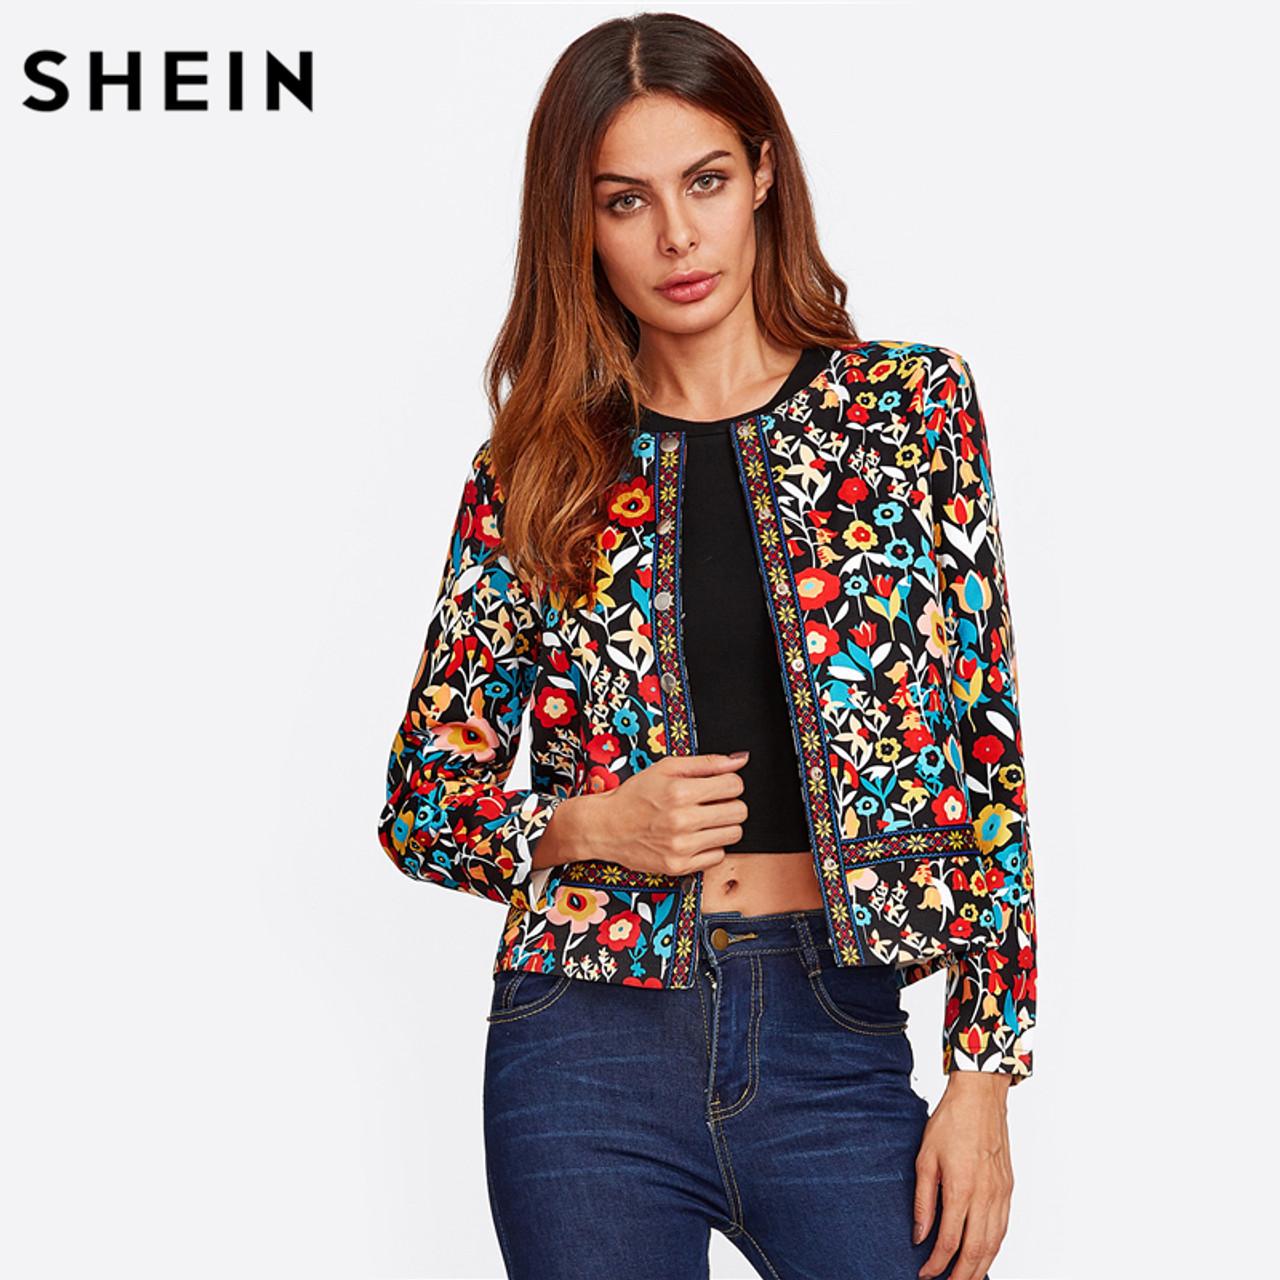 45cb3fb42d SHEIN Press Button Placket Botanical Jacket Autumn Jacket for Women  Multicolor Collarless Single Breasted Elegant Jacket ...